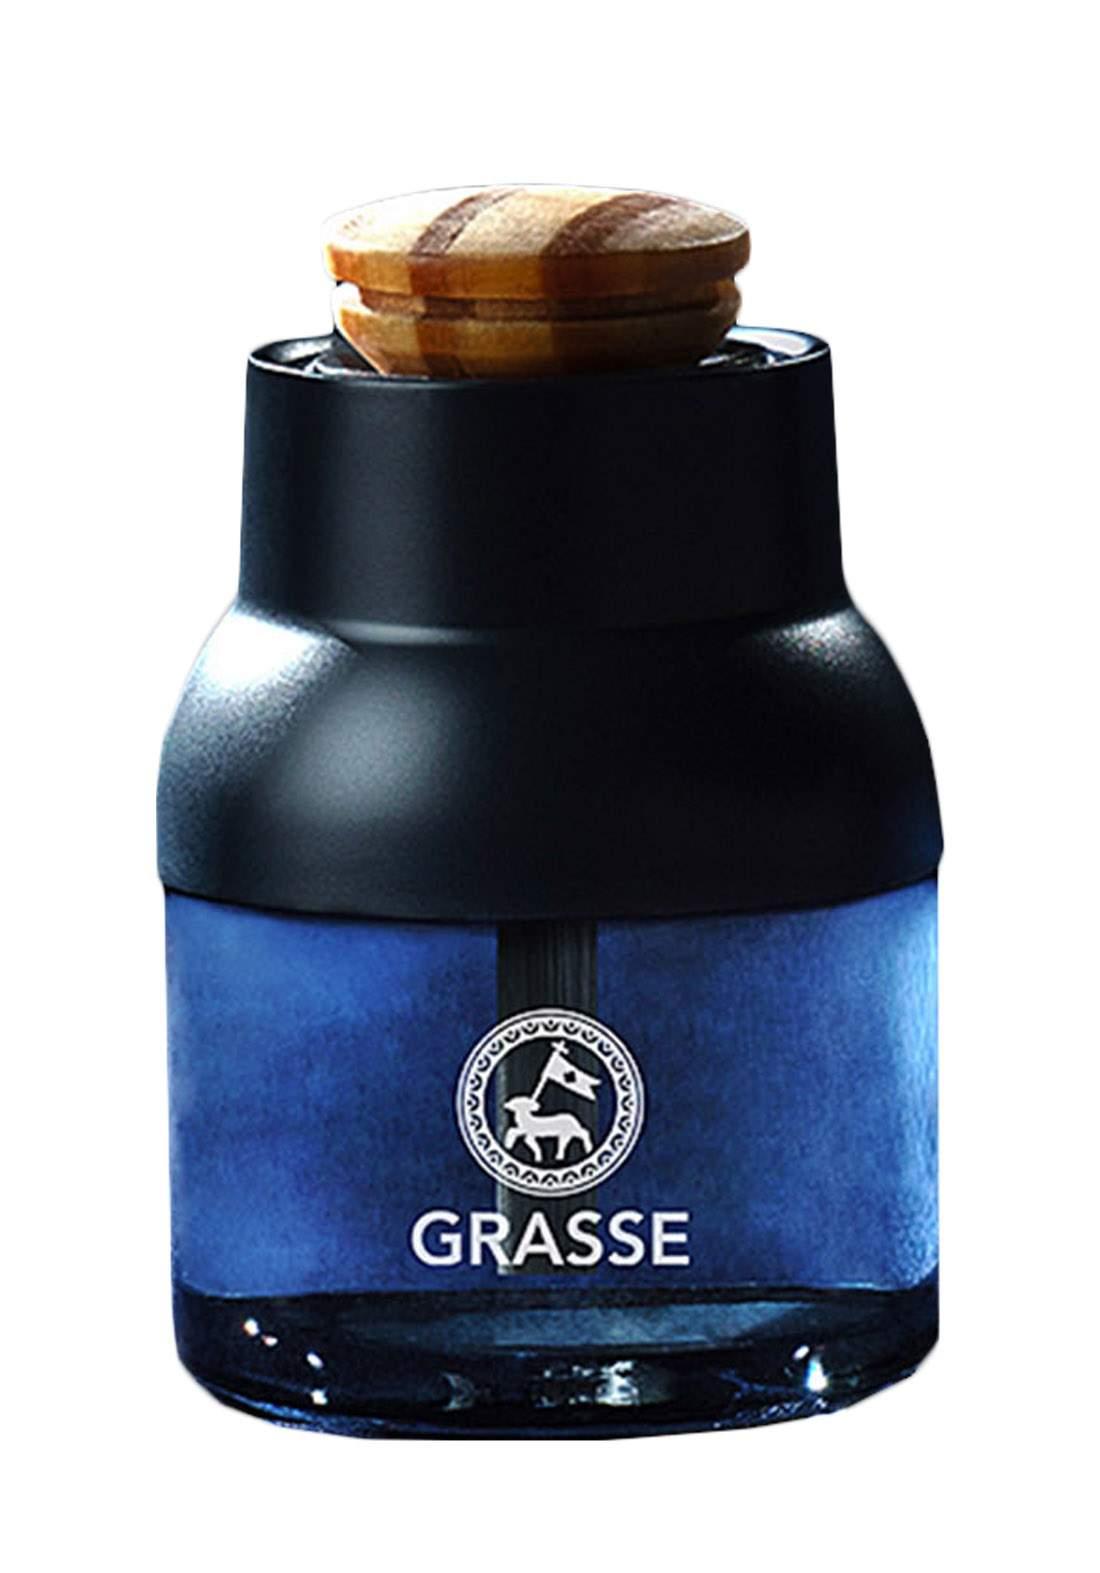 Bullsone Grasse L'esterel Car Perfume  معطر جو للسيارات برائحة التوت